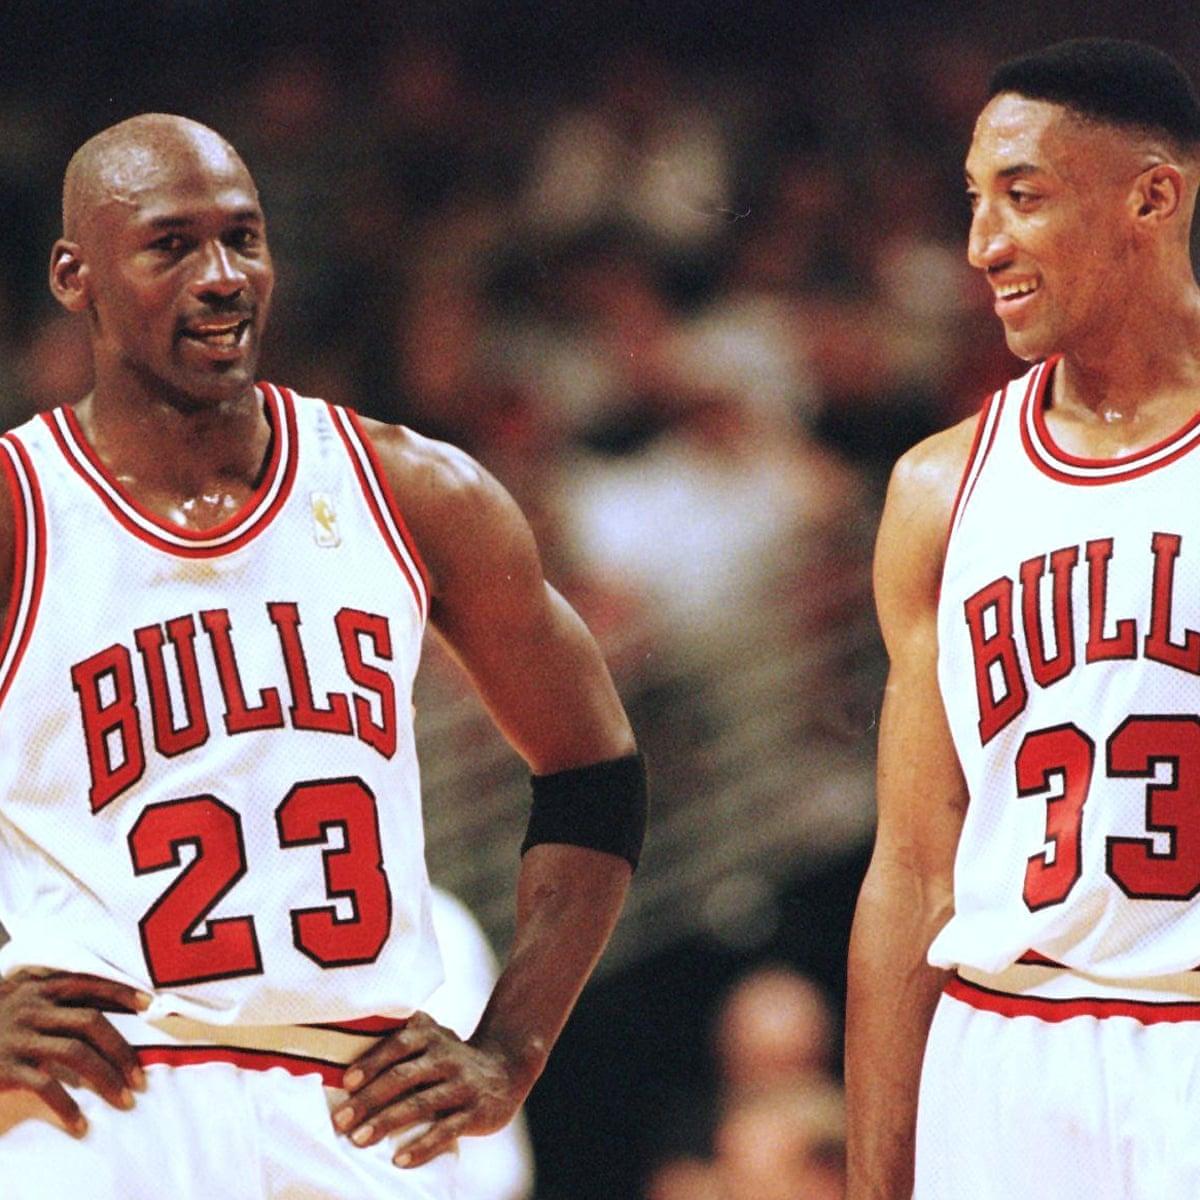 Scottie Pippen Denies The Last Dance Caused A Rift With Michael Jordan Michael Jordan The Guardian